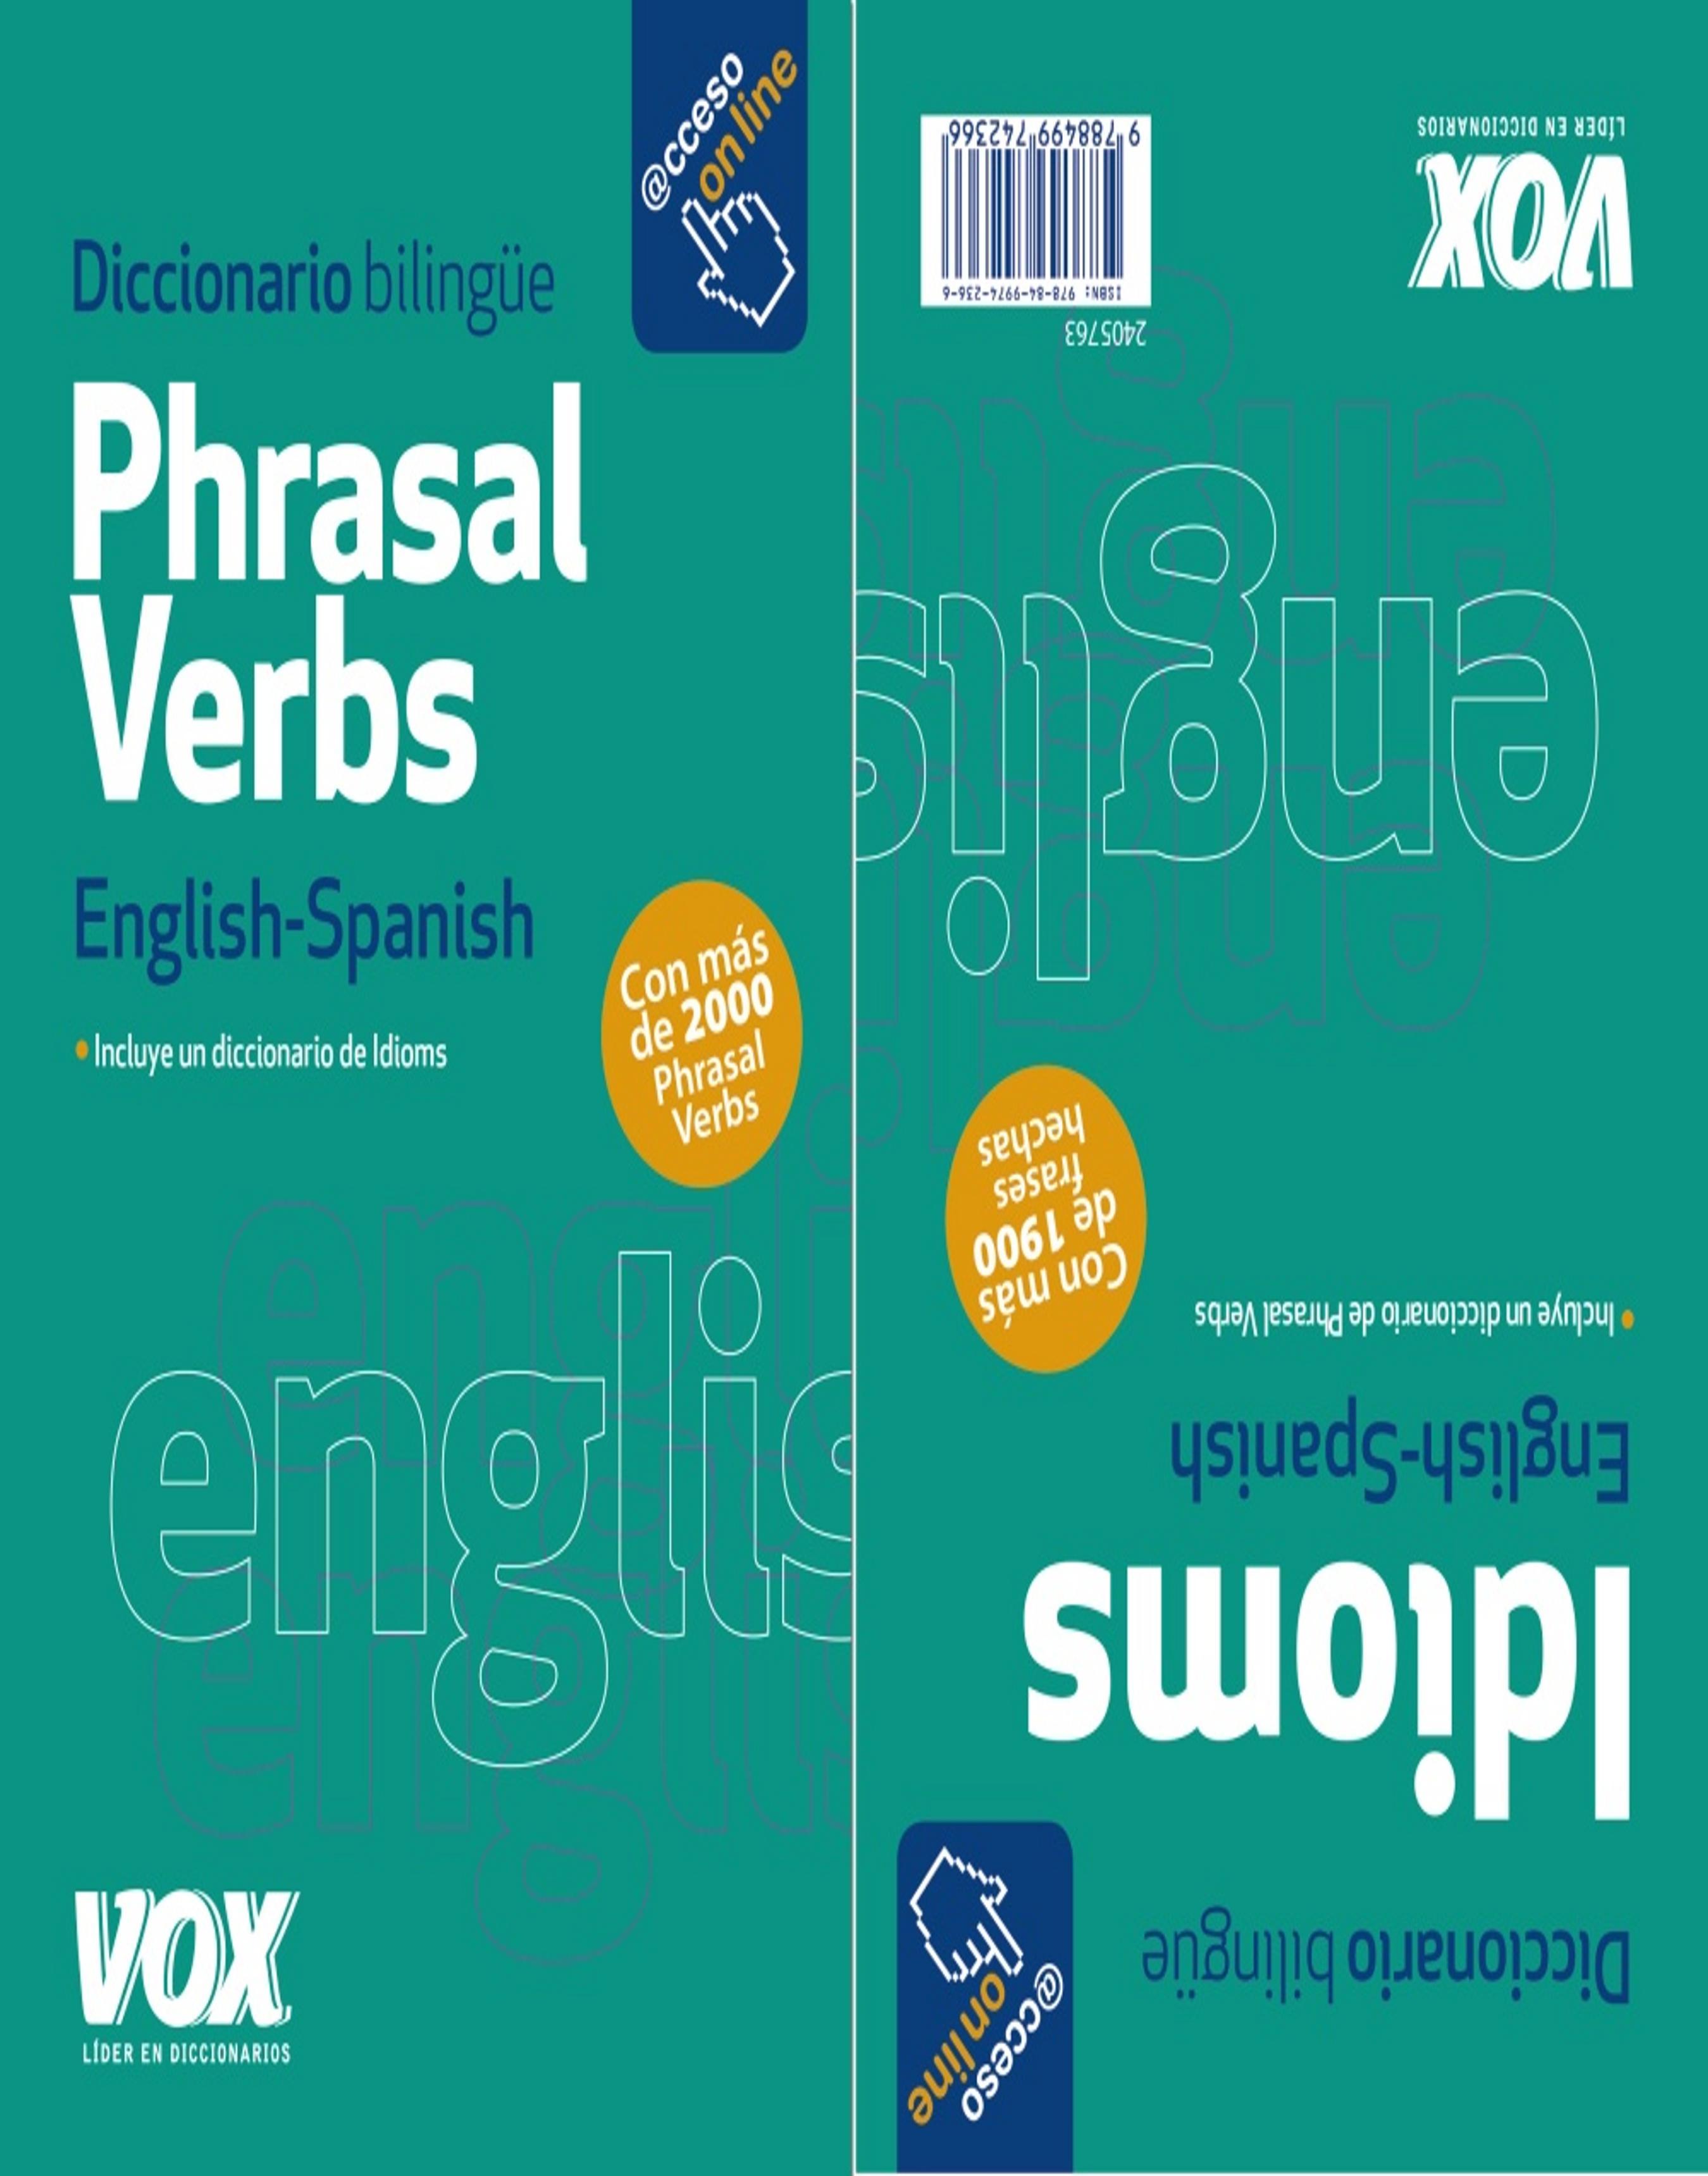 DICC BILINGÜE IDIOMS + PHRASAL VERBS English / Spanish Acceso Online